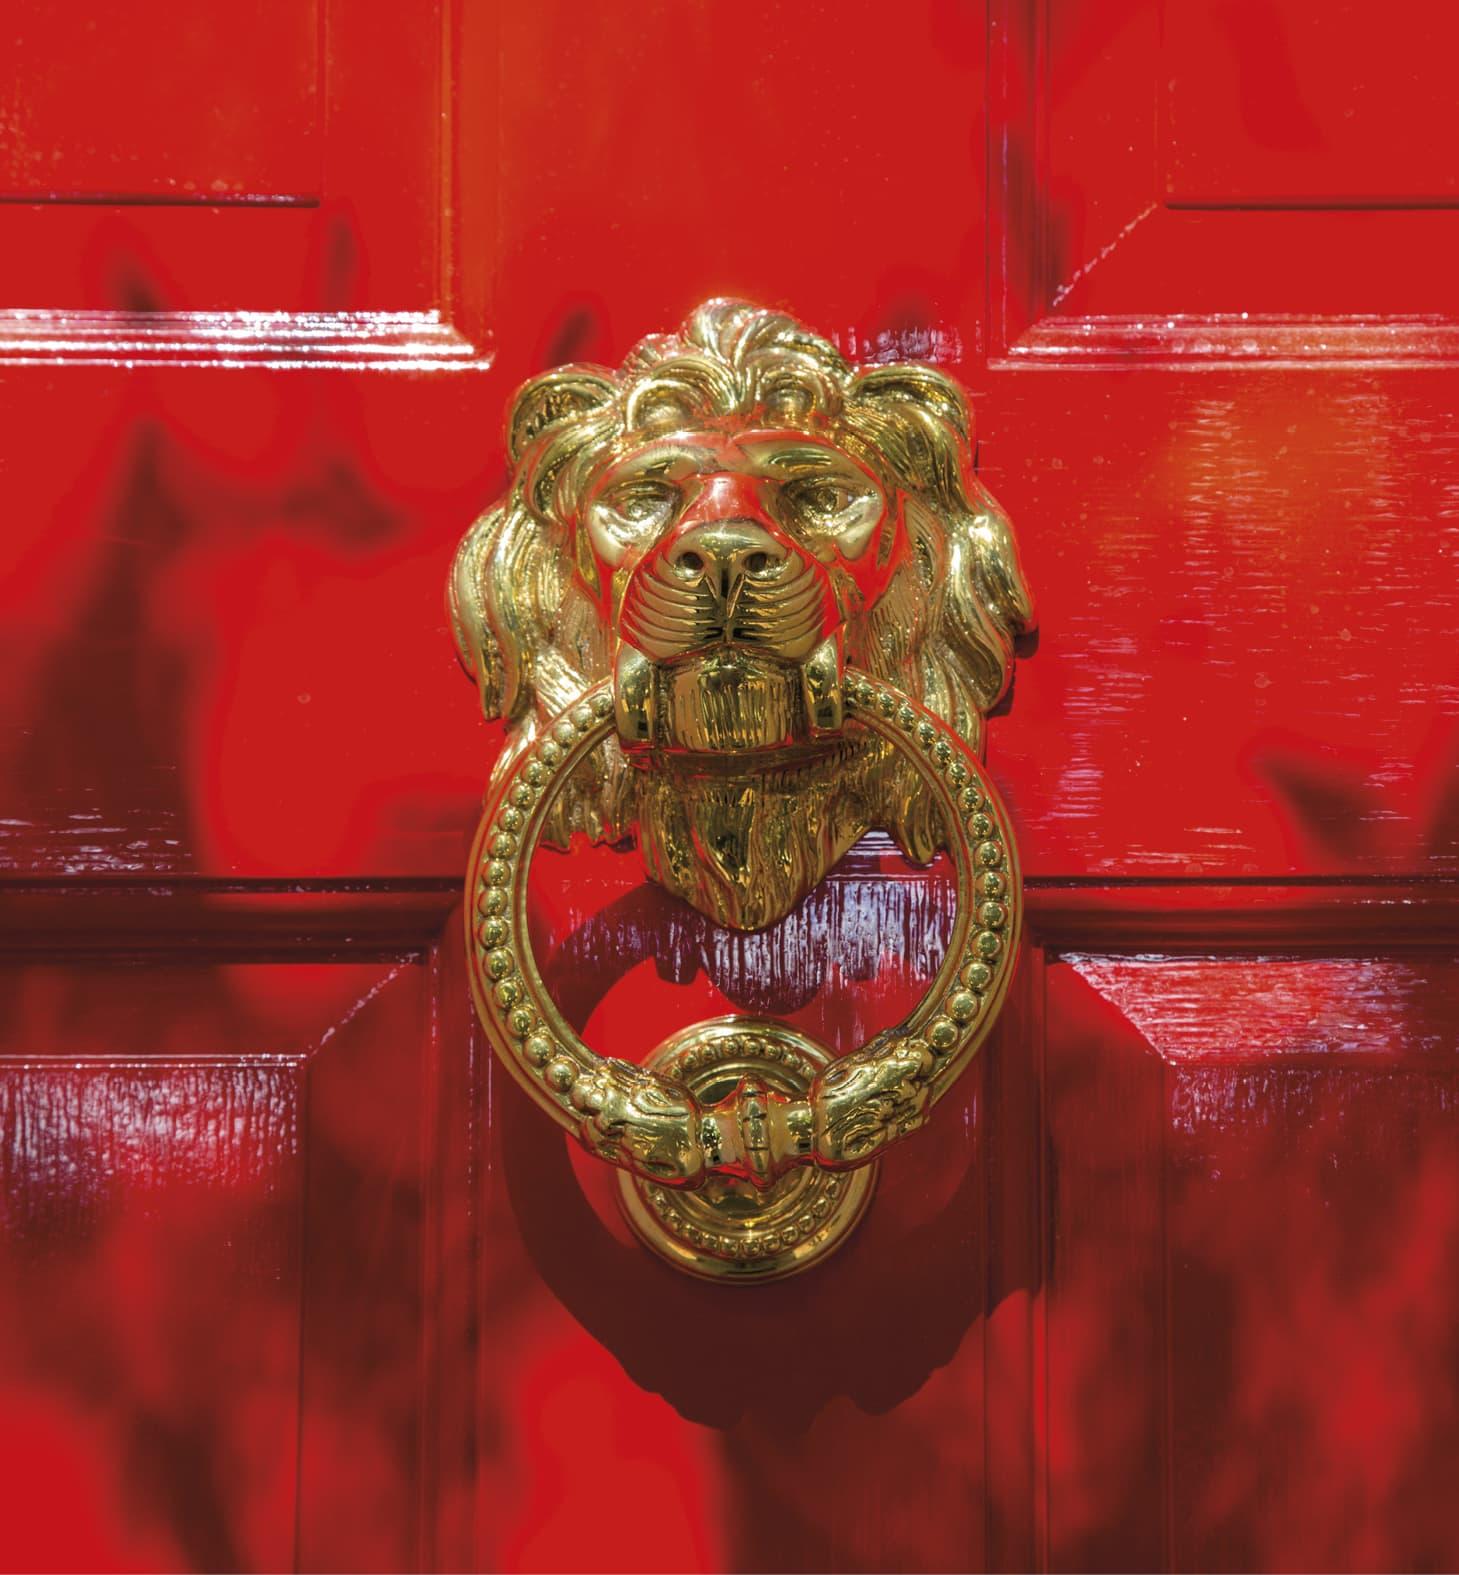 Closeup of a lion's head knocker on a red door